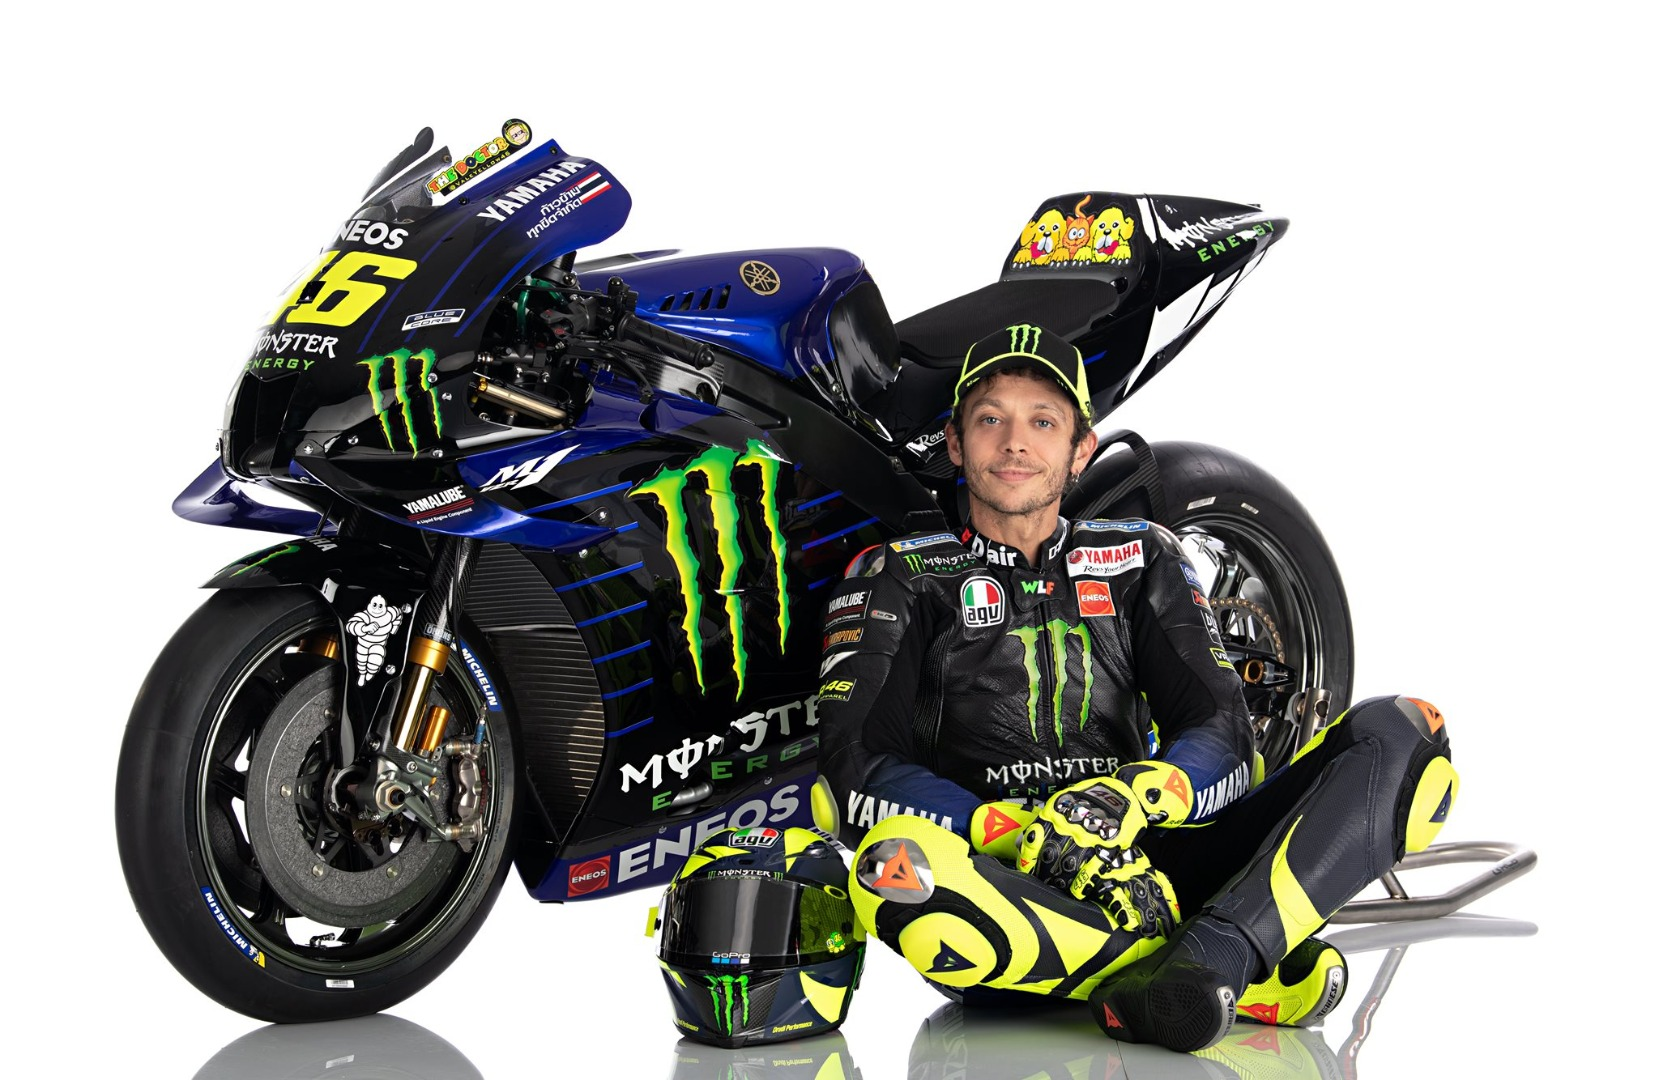 Yamaha YZR-M1 MotoGP 2020 - Maverick Viñales & Valentino Rossi